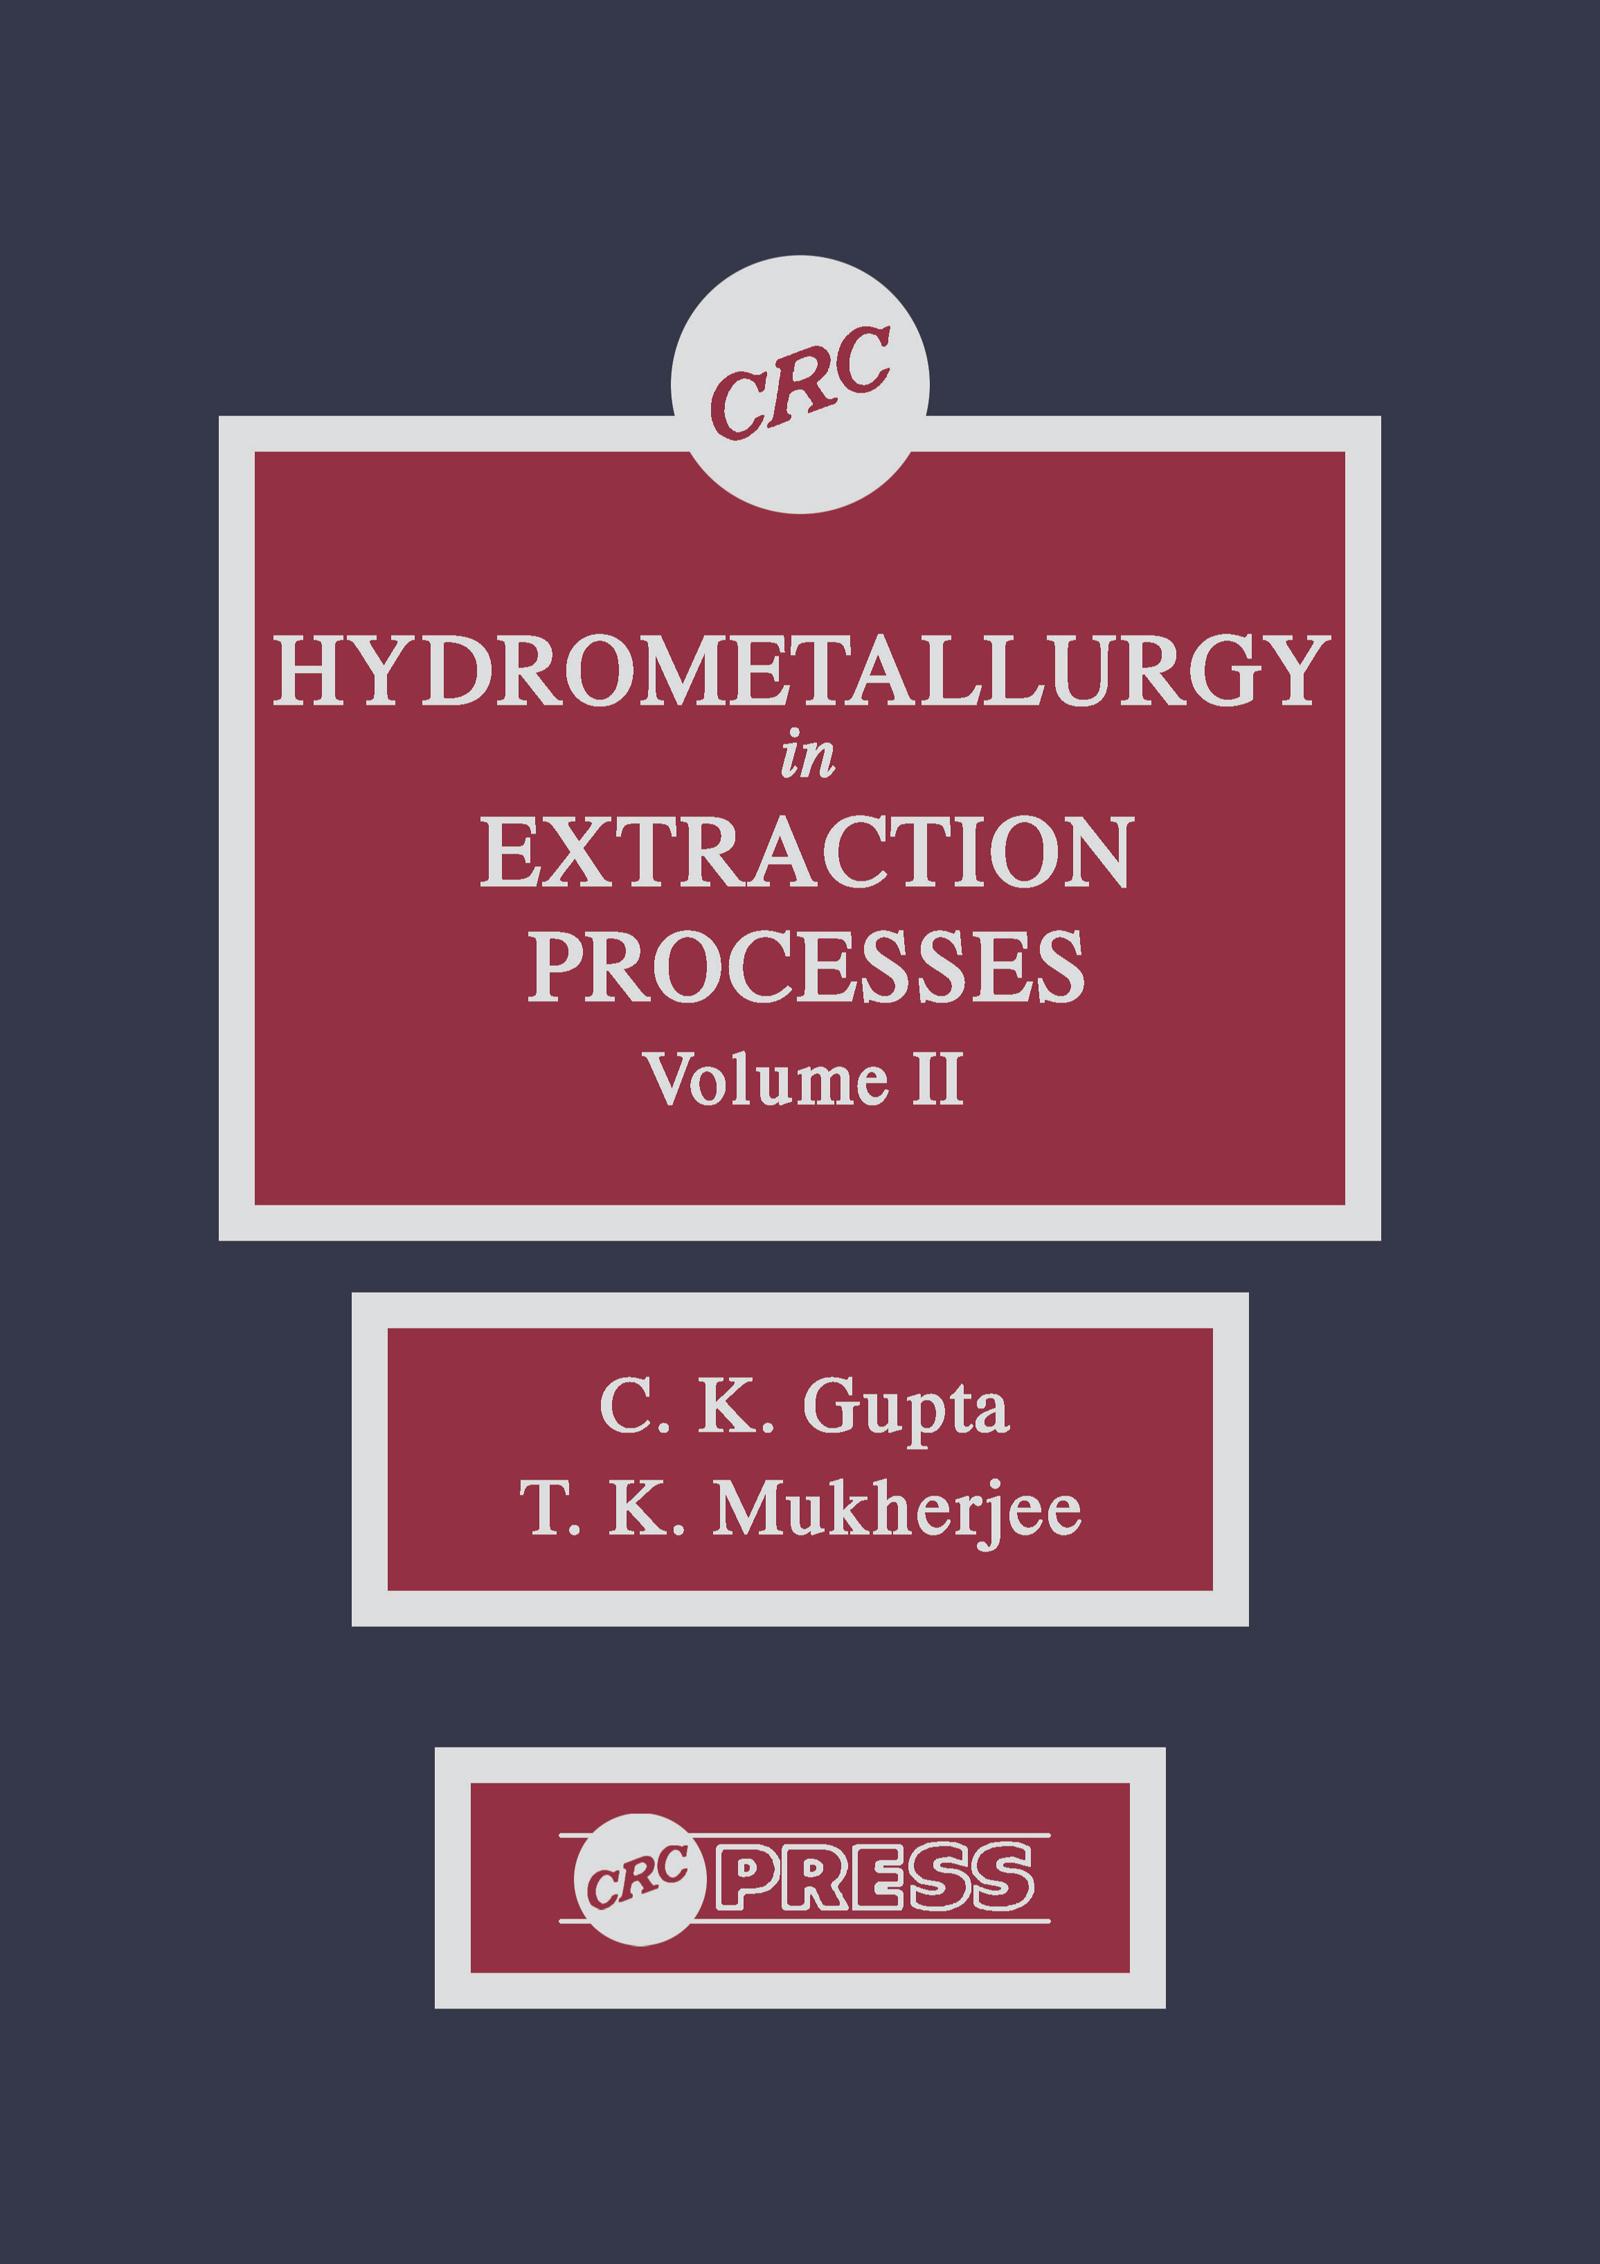 Hydrometallurgy in Extraction Processes, Volume II